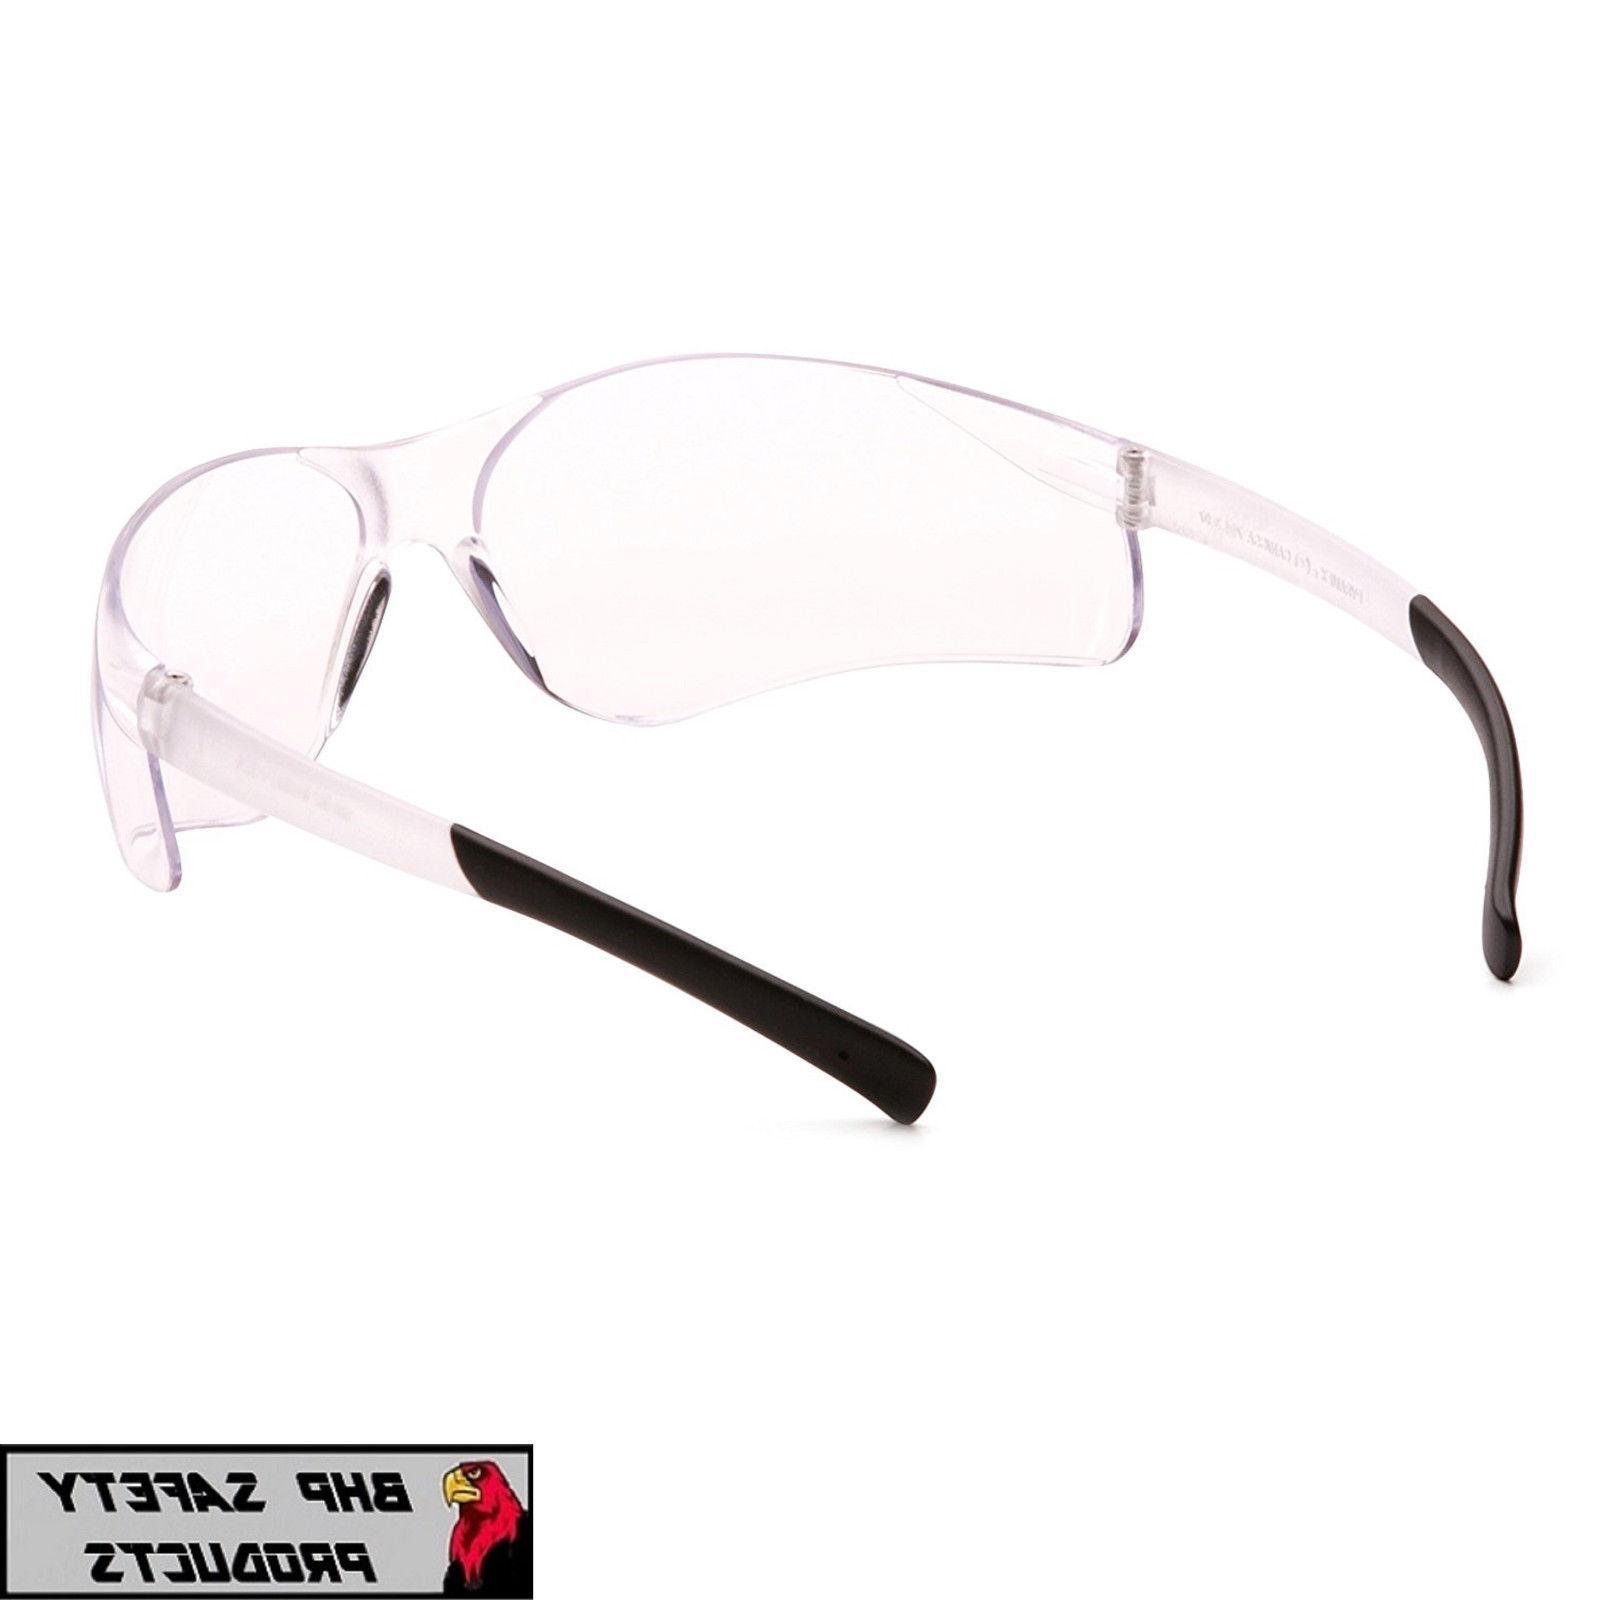 PYRAMEX ZTEK SAFETY GLASSES CLEAR BIFOCAL +2.00 LENS